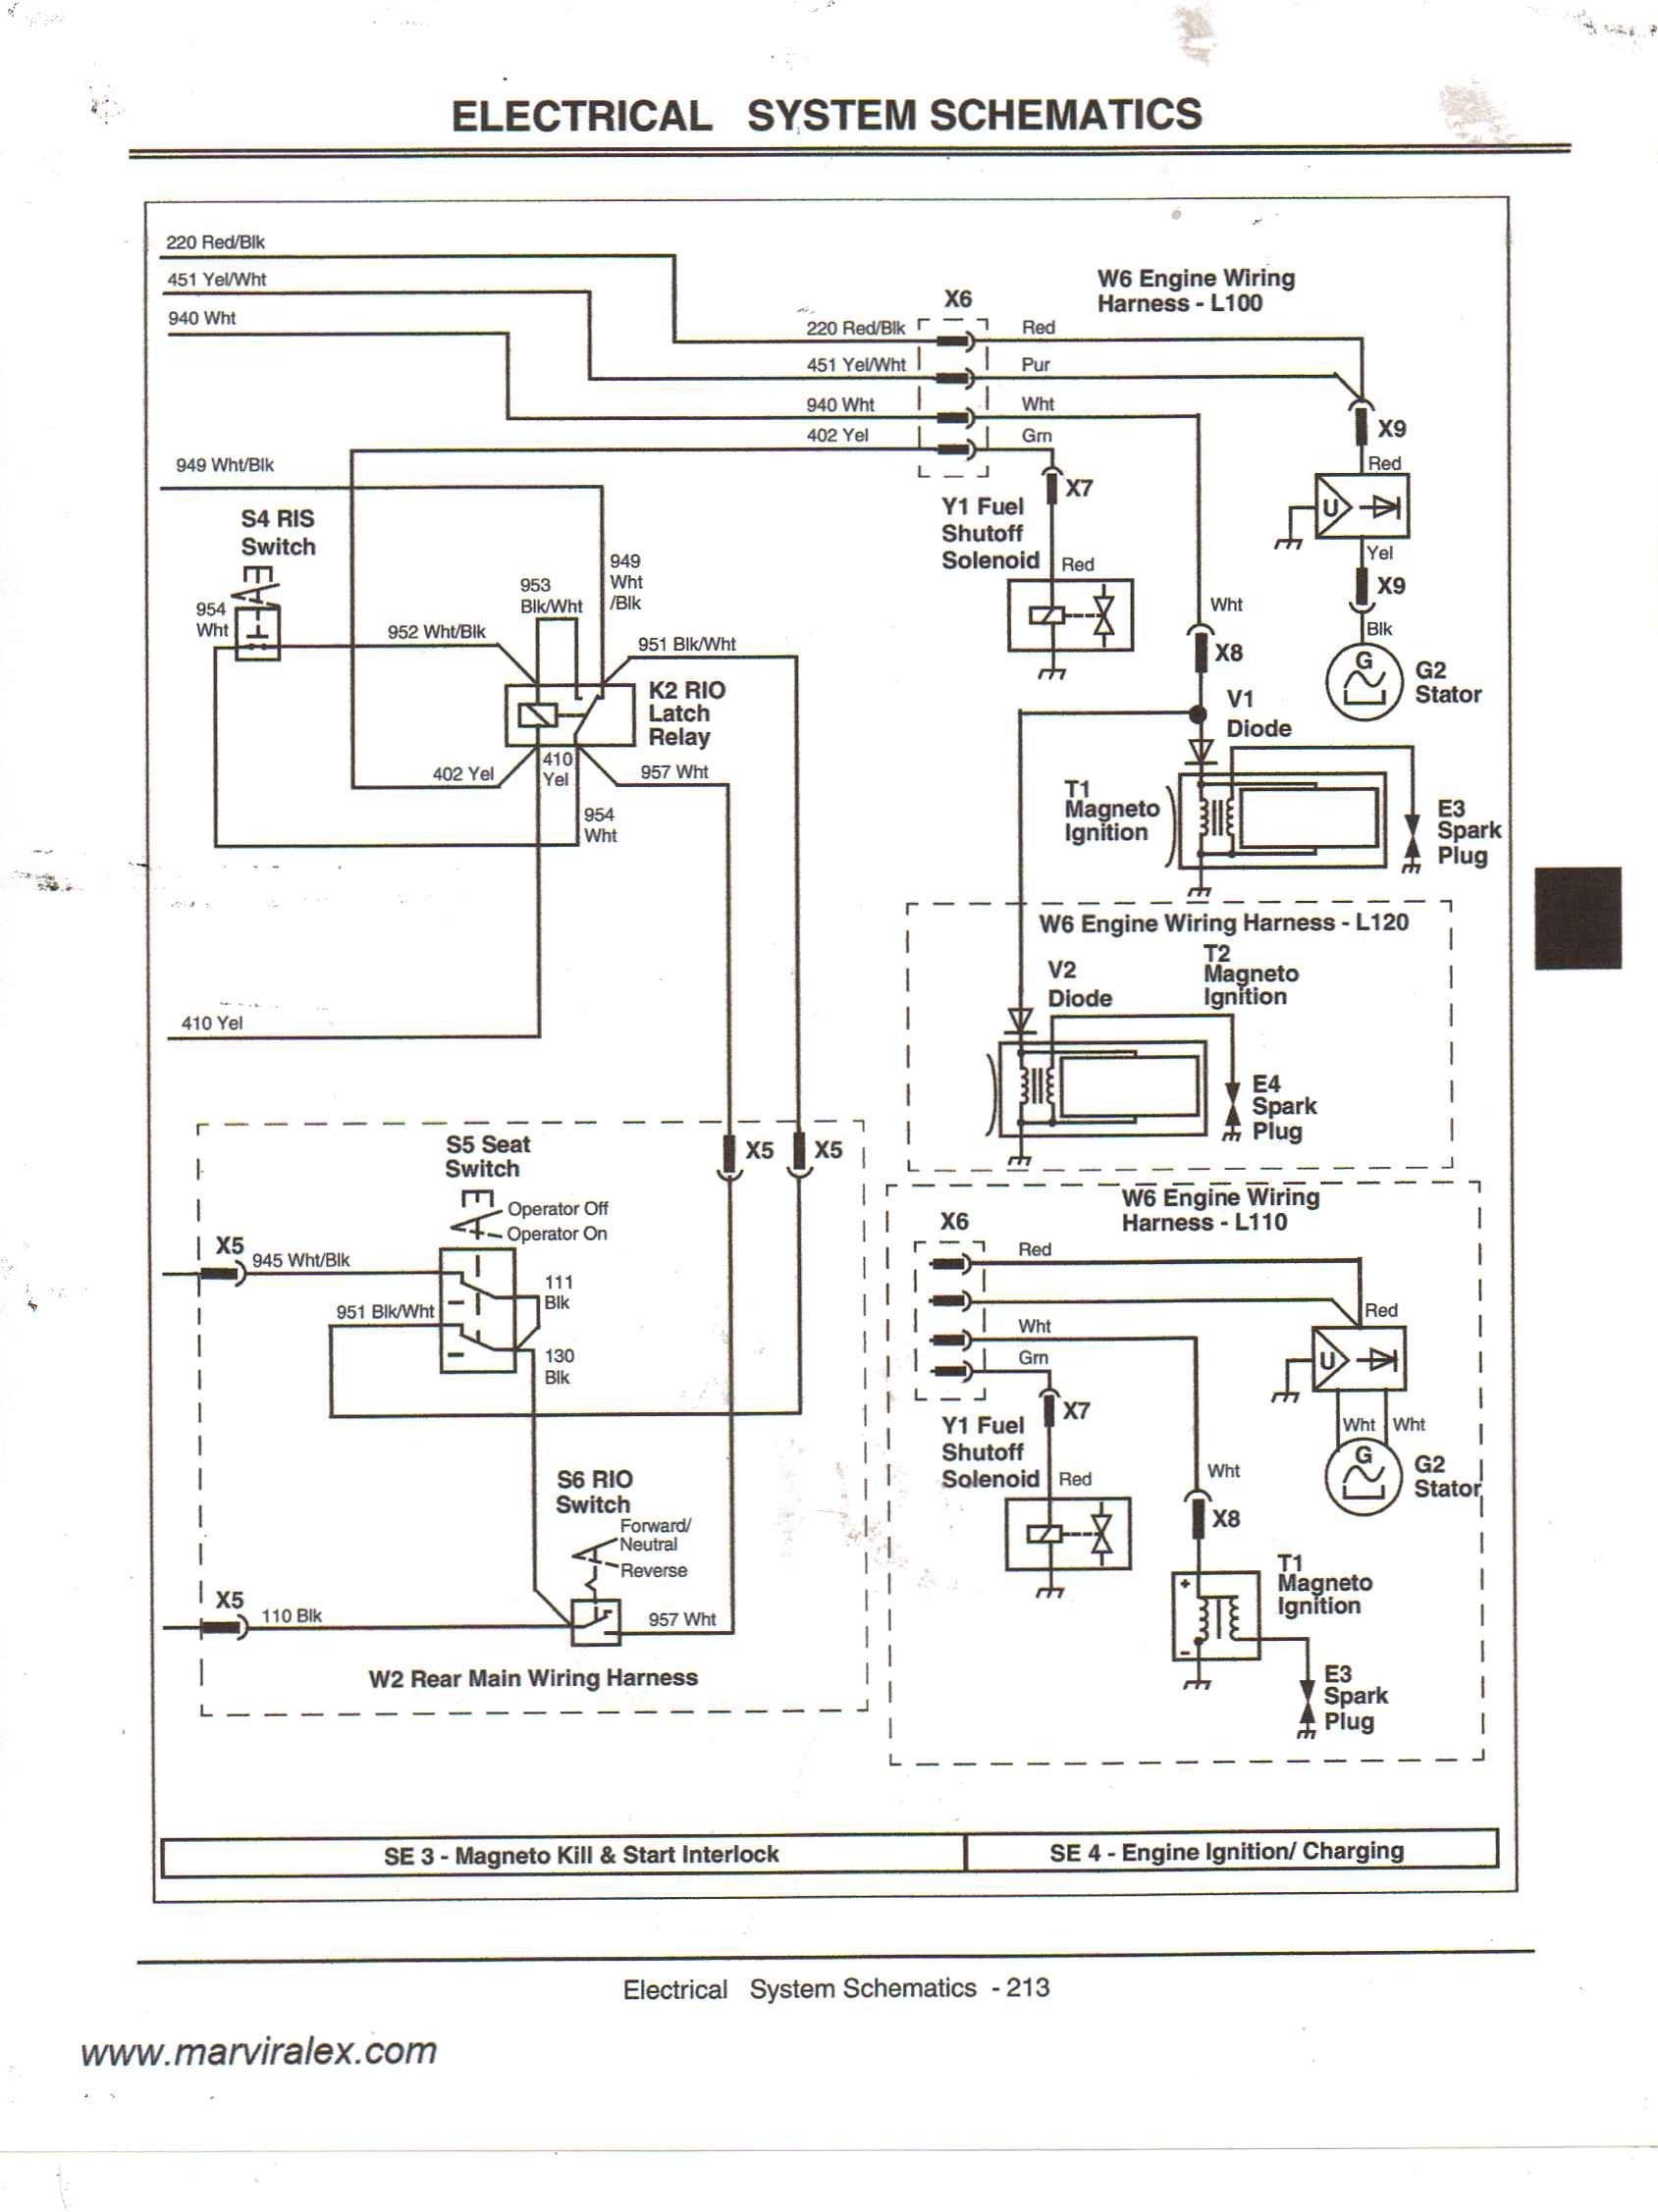 1978 John Deere Gator Electrical Diagram Ww 3110] Black and Decker Electric Lawn Mower Mm850 Wiring Of 1978 John Deere Gator Electrical Diagram